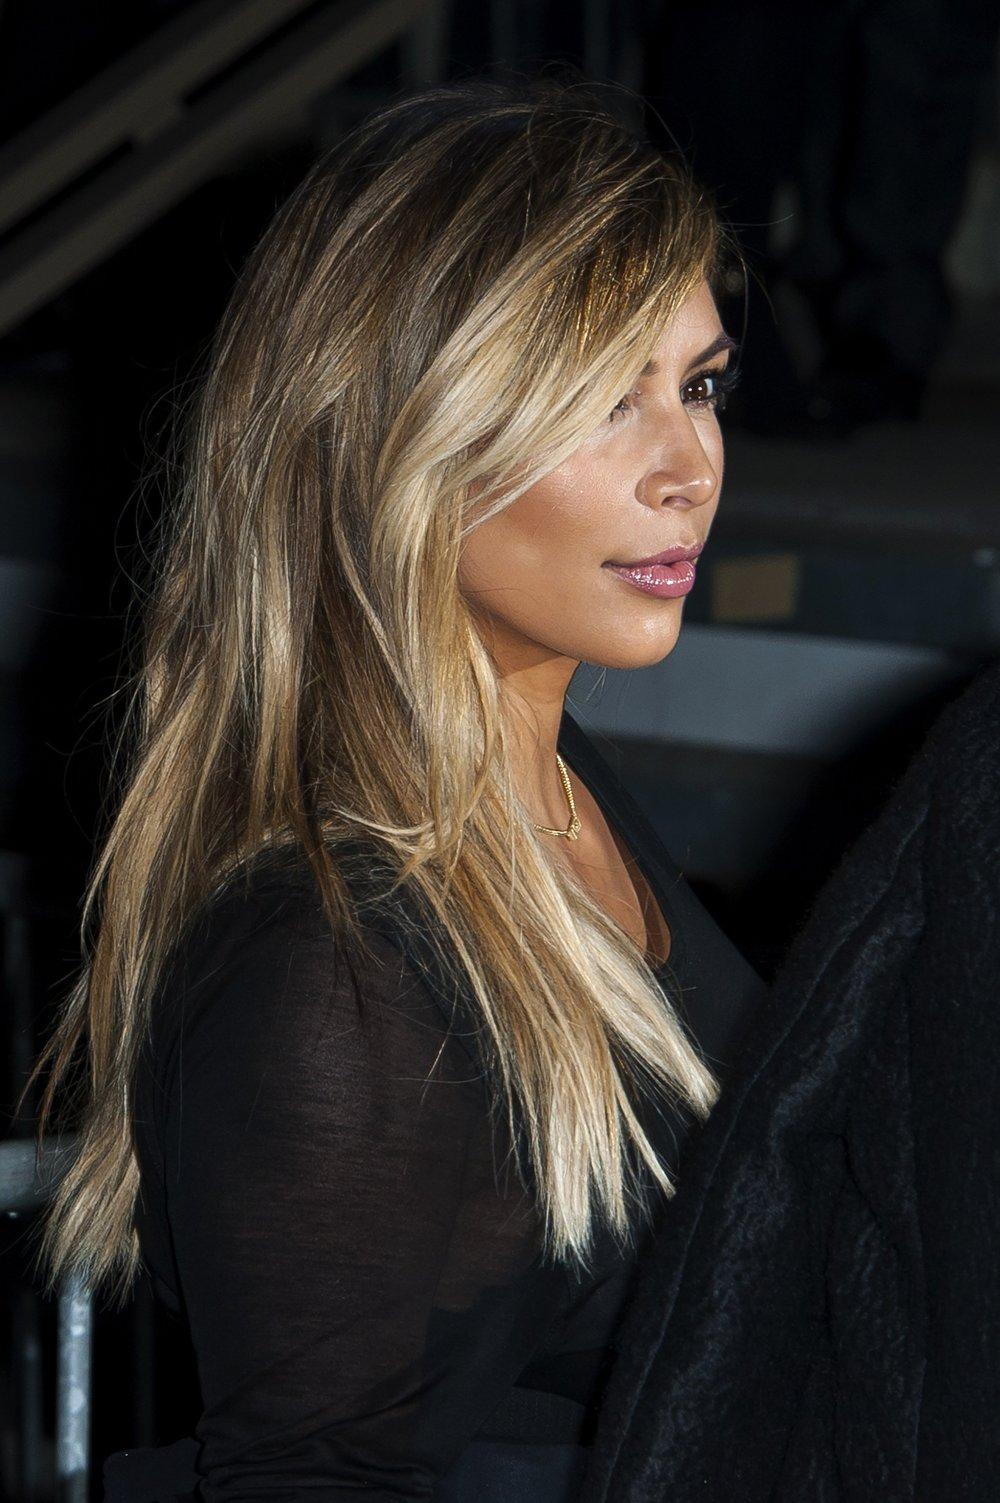 Kim Kardashian Givenchy Fashion Show in Paris France Lip Color